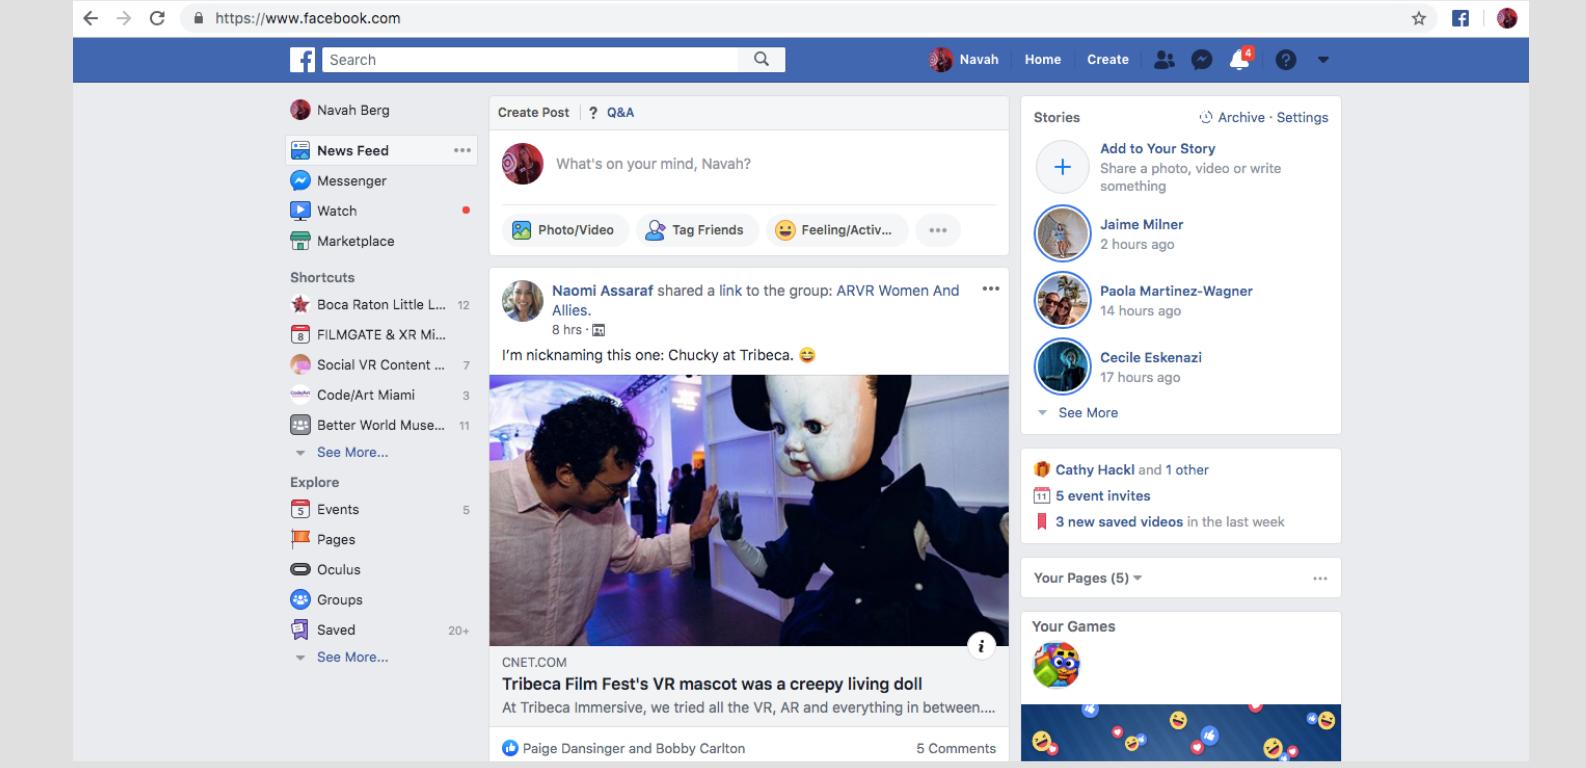 news.feed.facebook.old